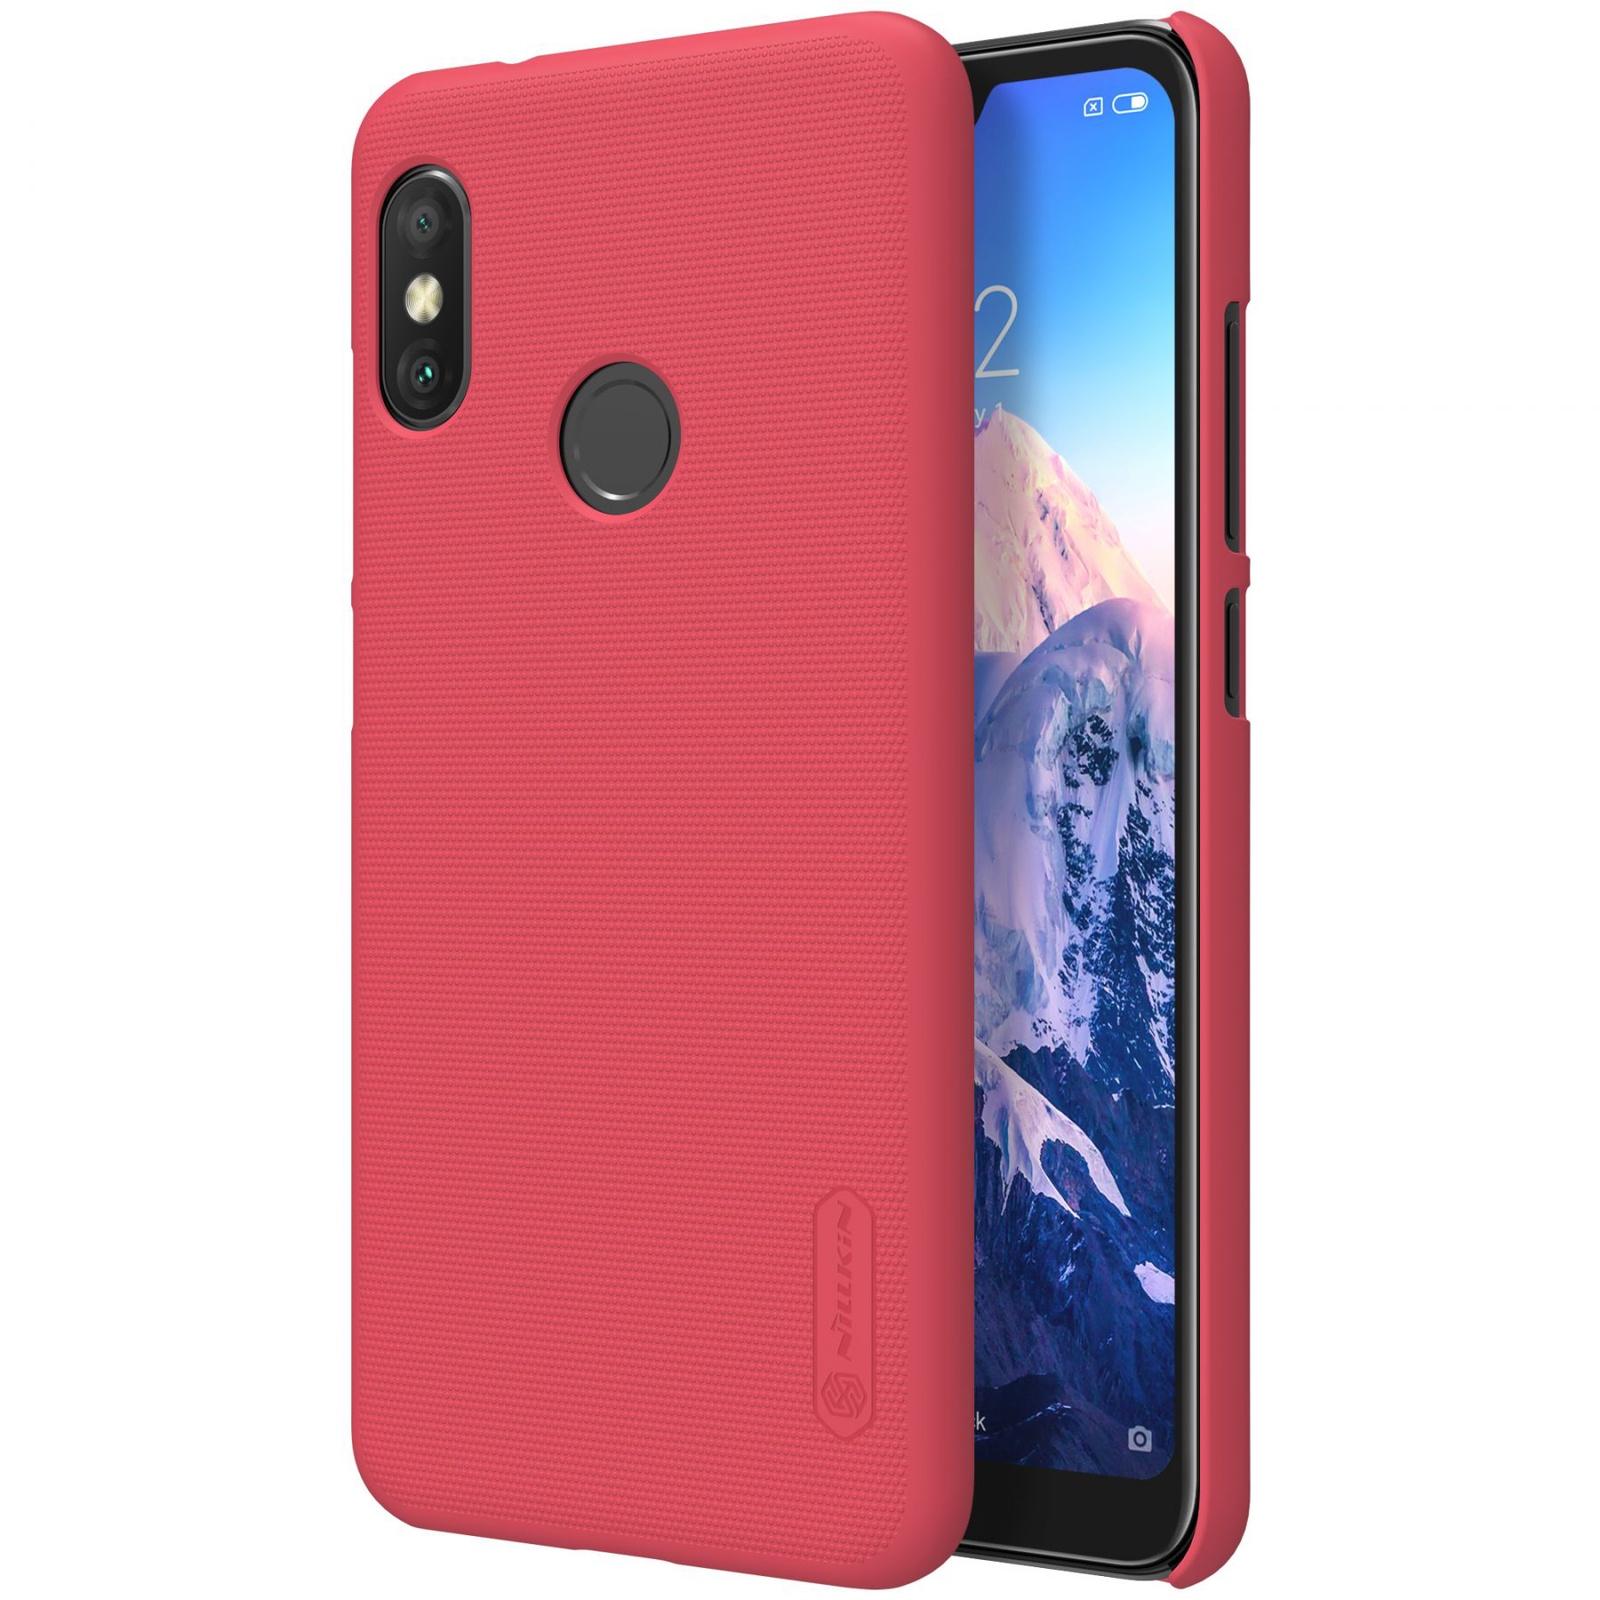 Чехол для сотового телефона Nillkin Накладка Frosted Xiaomi Redmi S2 Red, красный